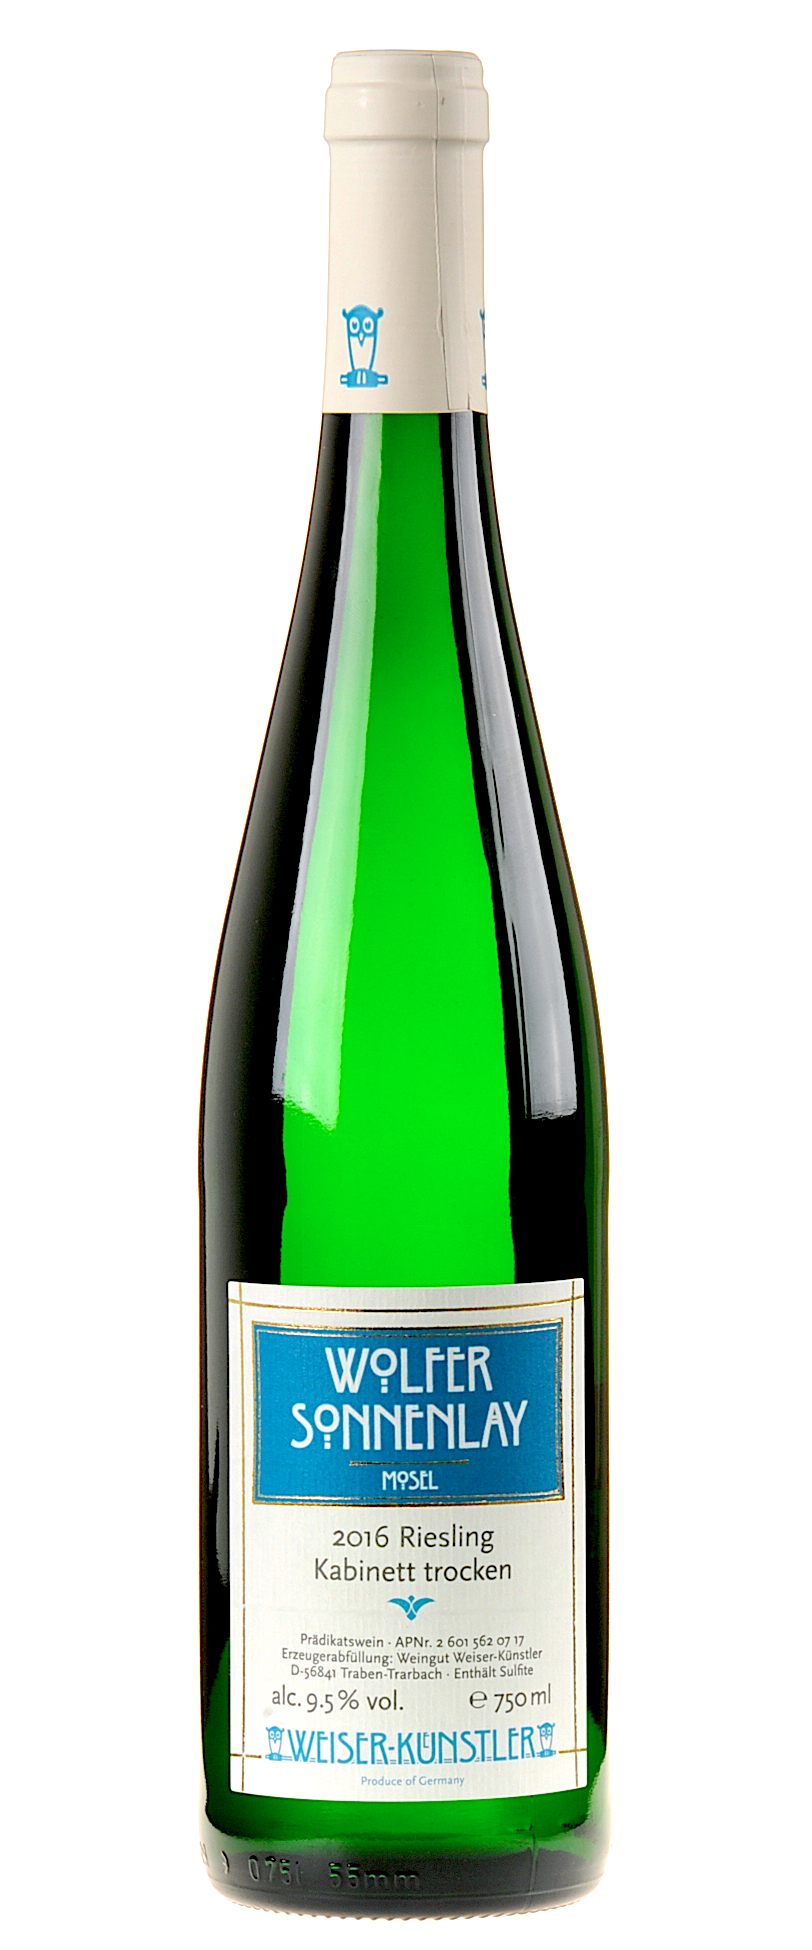 Weiser-Künstler Riesling Wolfer Sonnenlay Kabinett trocken 2016 ...